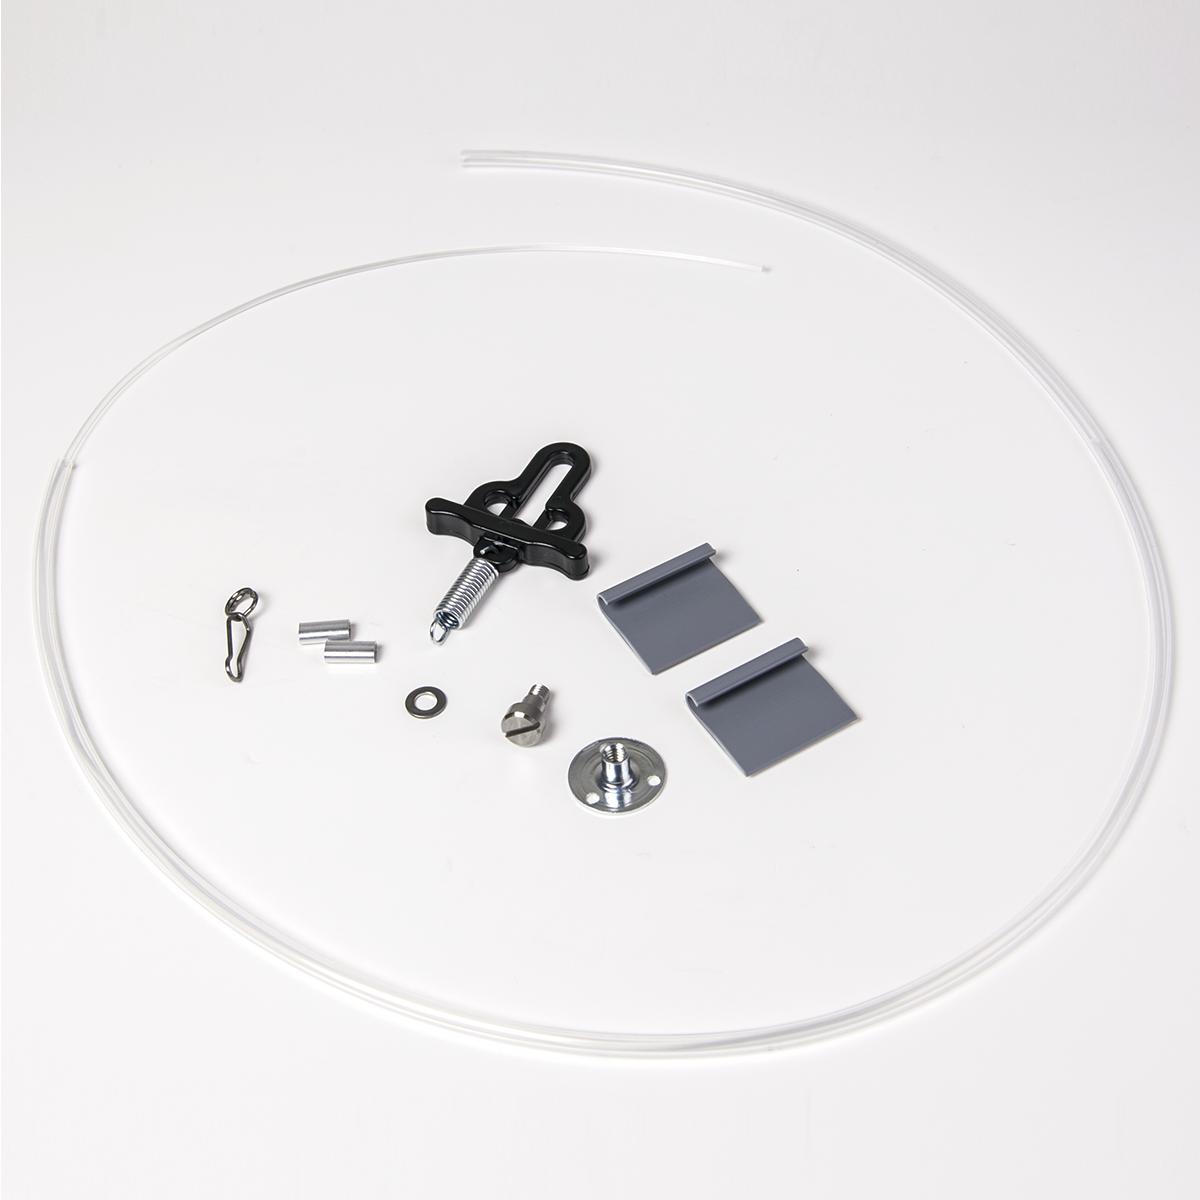 Knee External Lock Kit